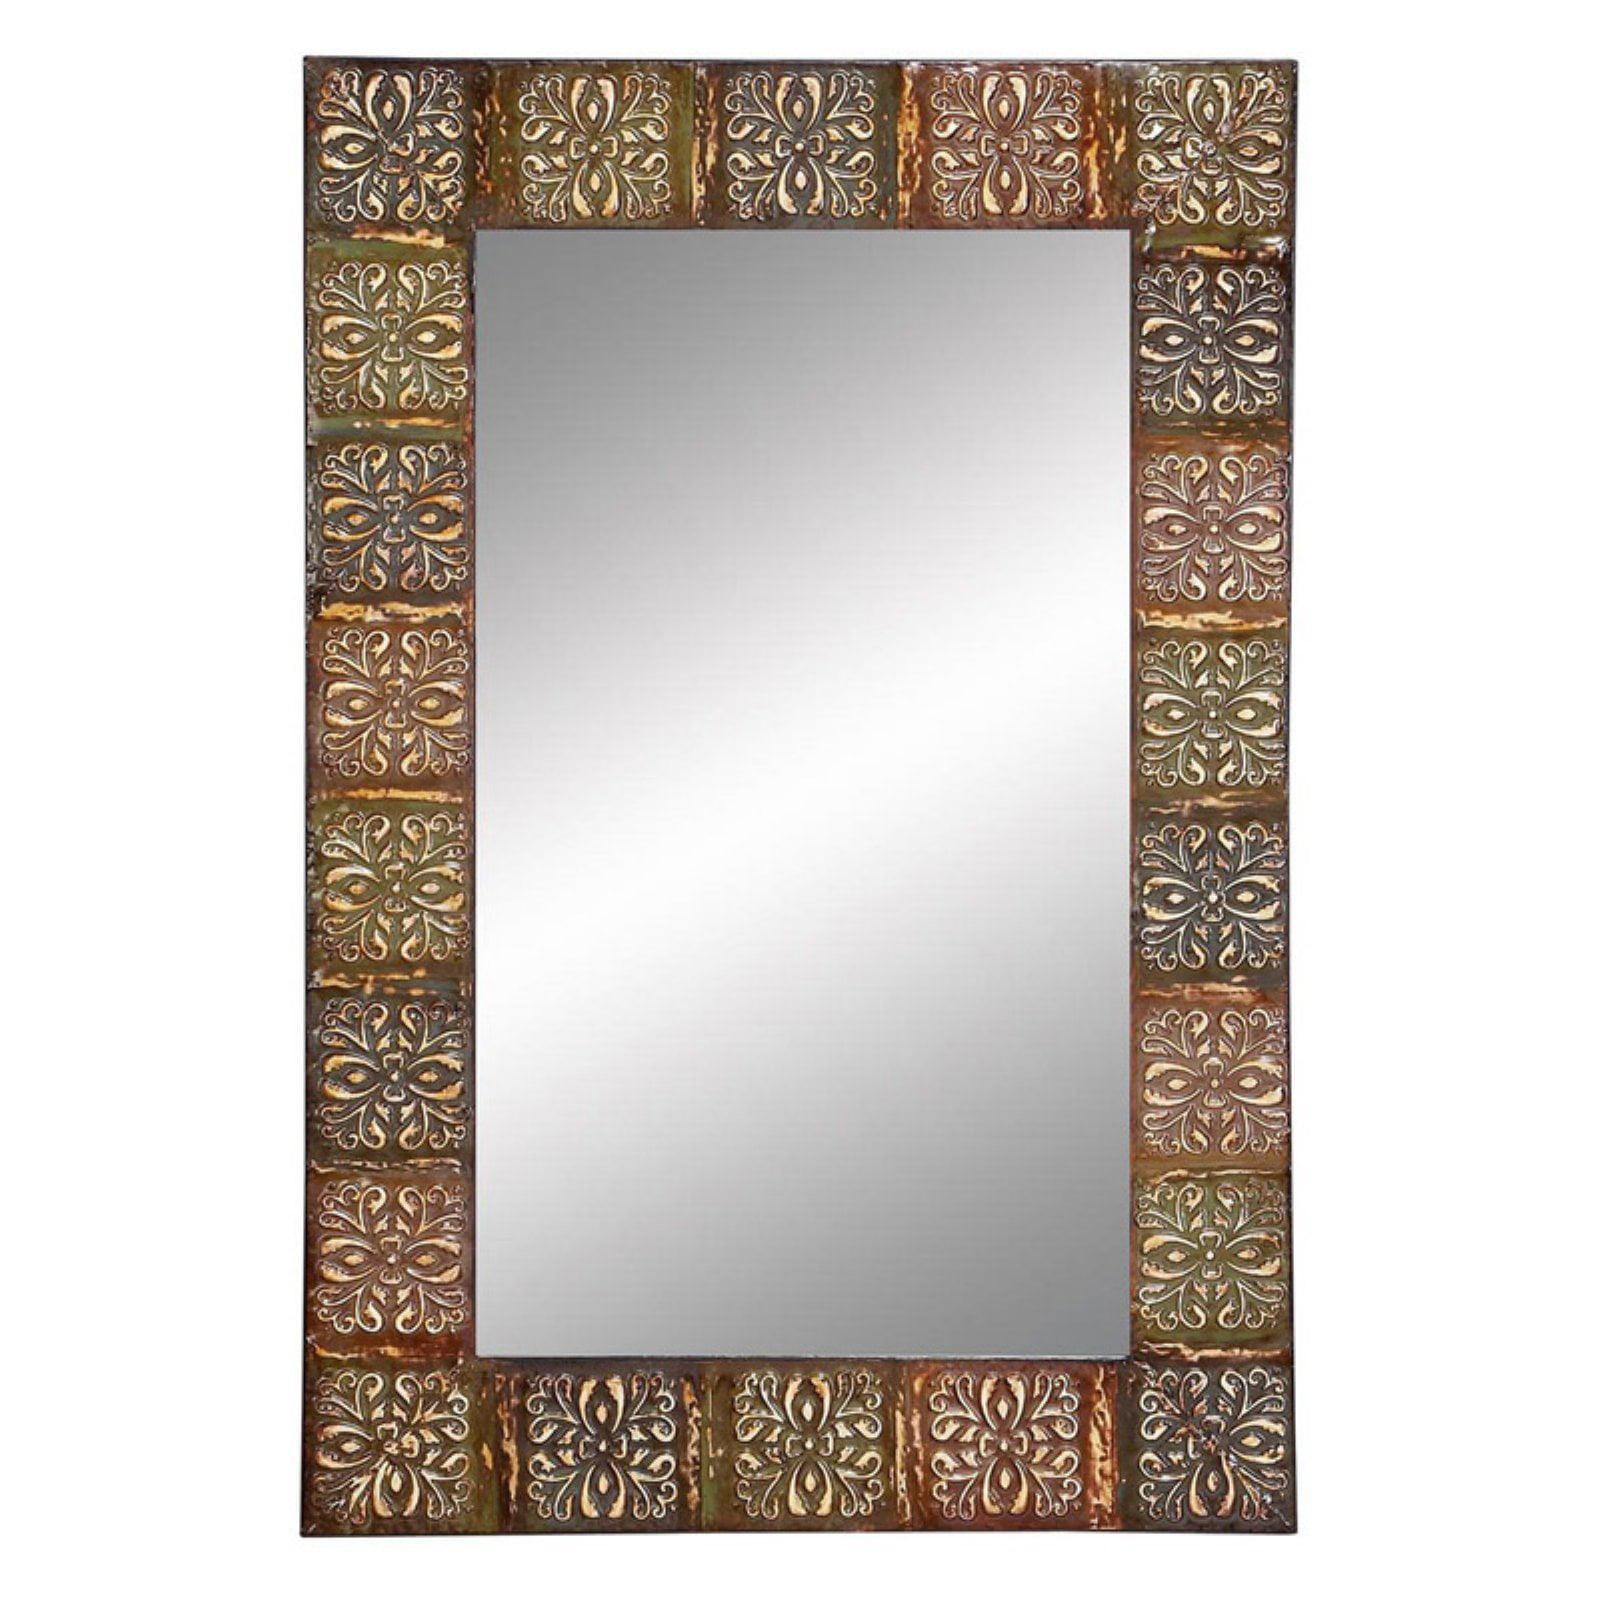 Decmode Metal Wall Mirror, Multi Color